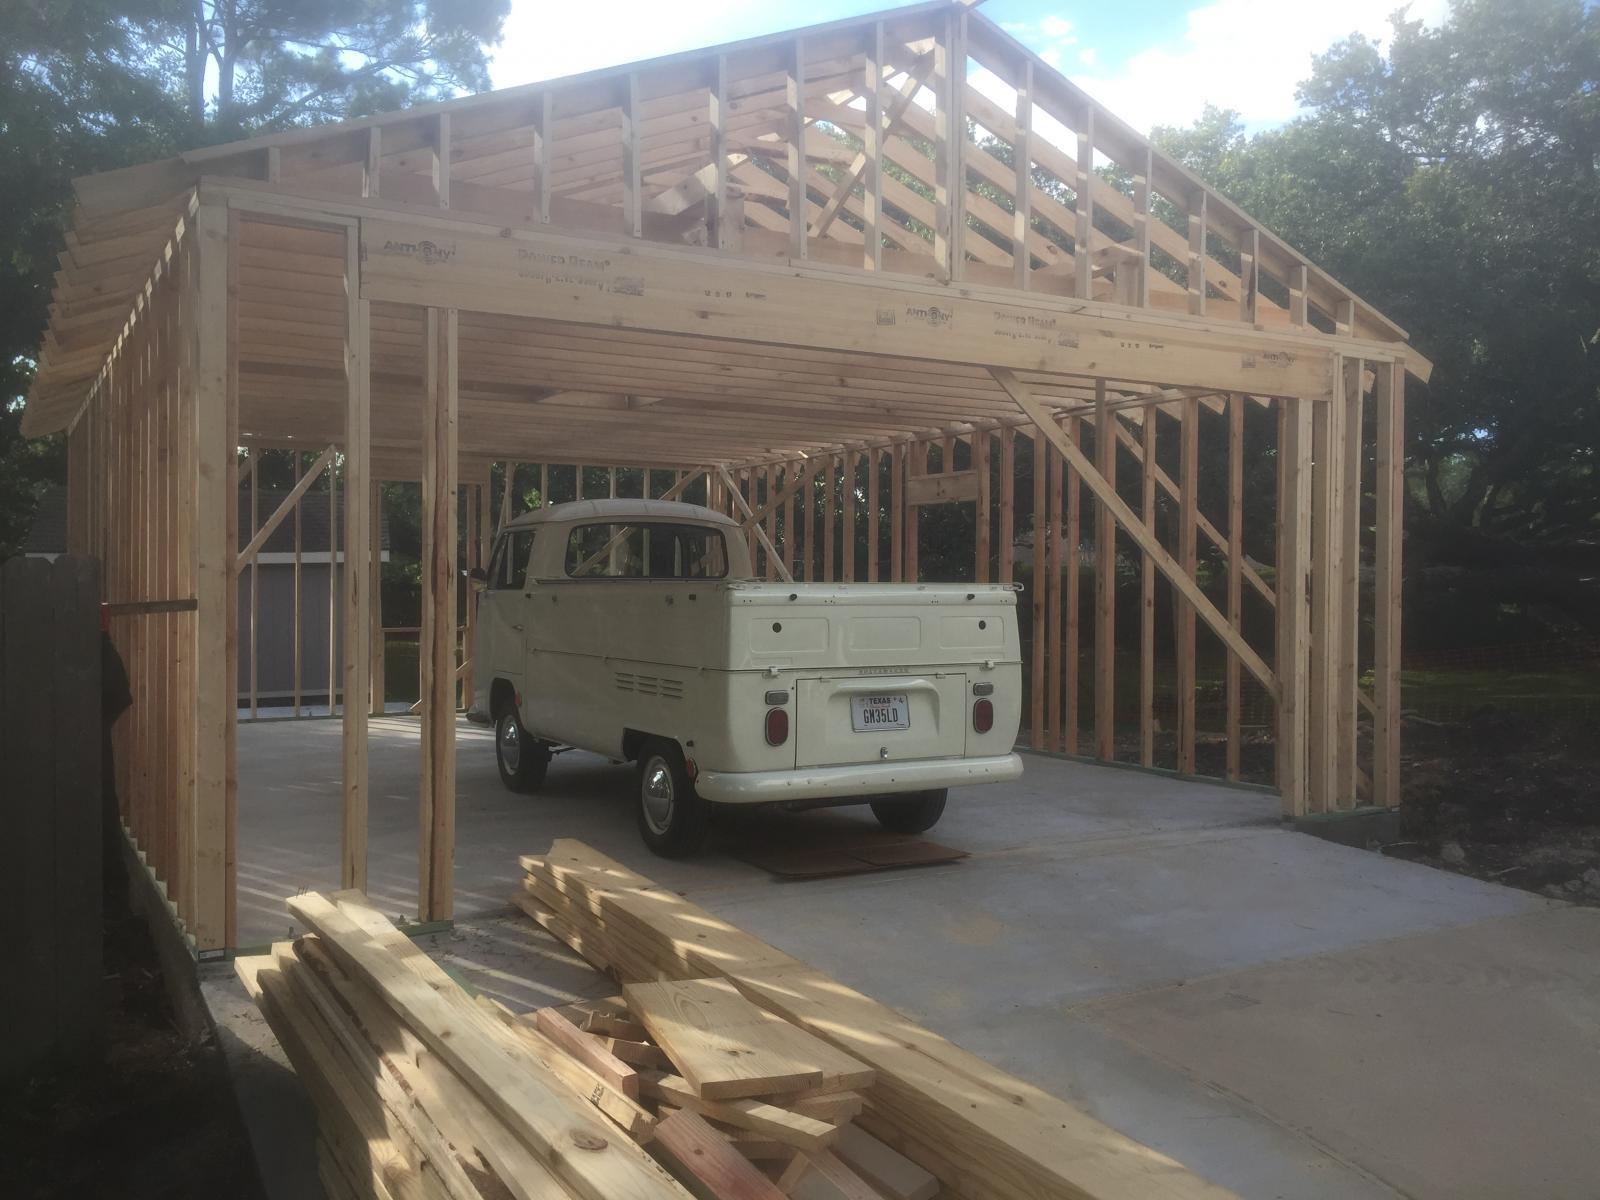 New bus barn